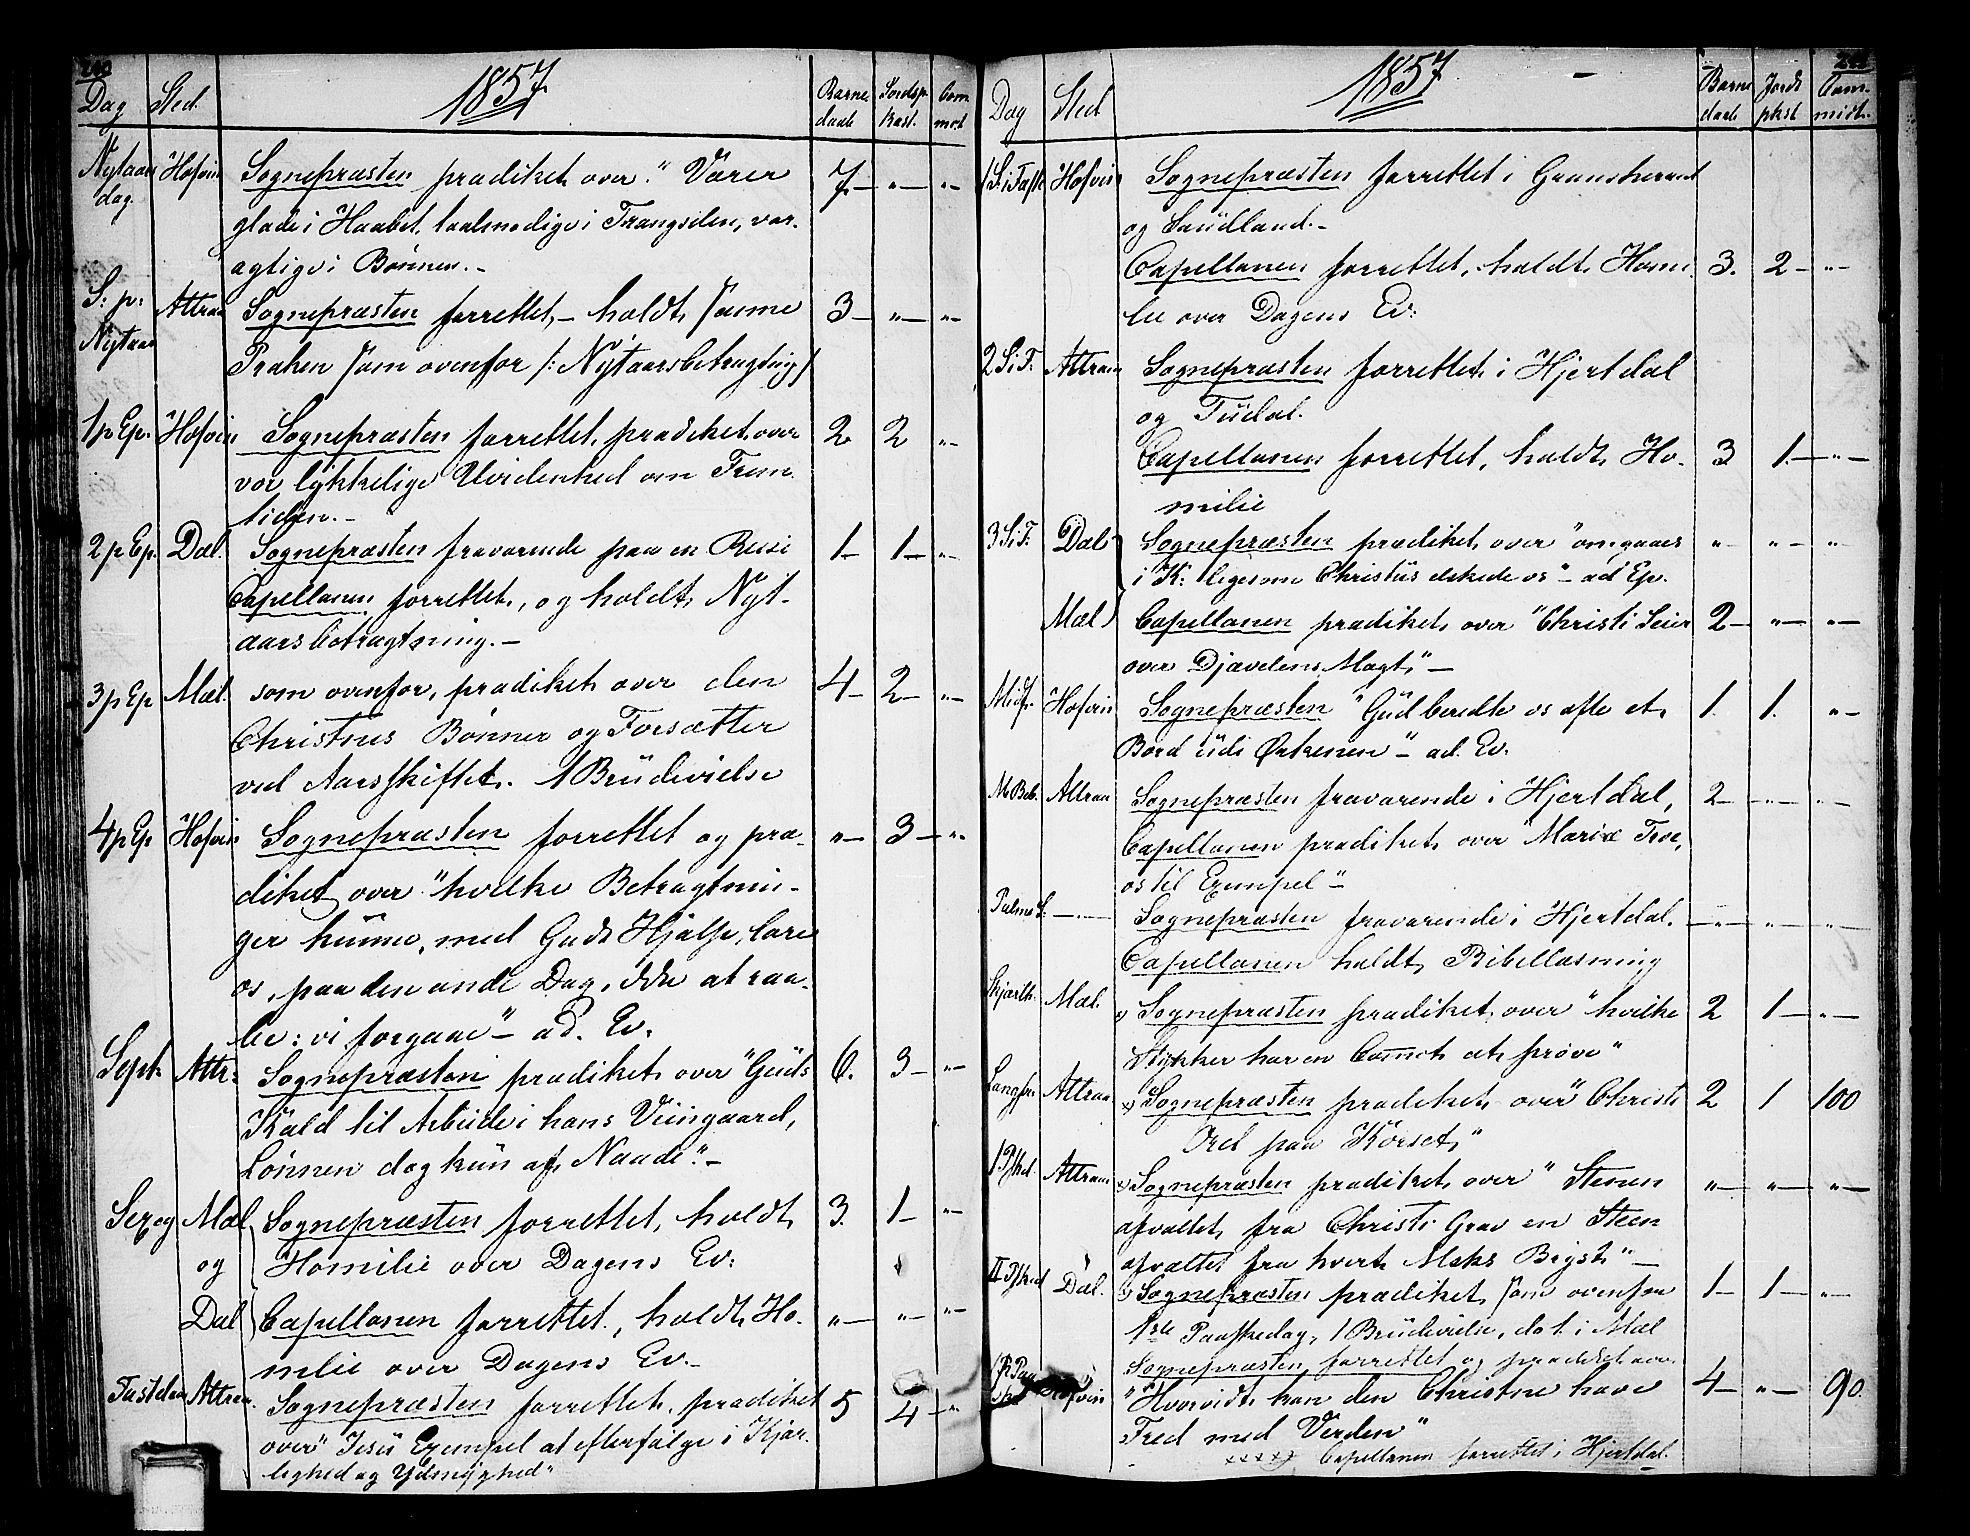 SAKO, Tinn kirkebøker, F/Fa/L0003: Ministerialbok nr. I 3, 1810-1814, s. 240-241